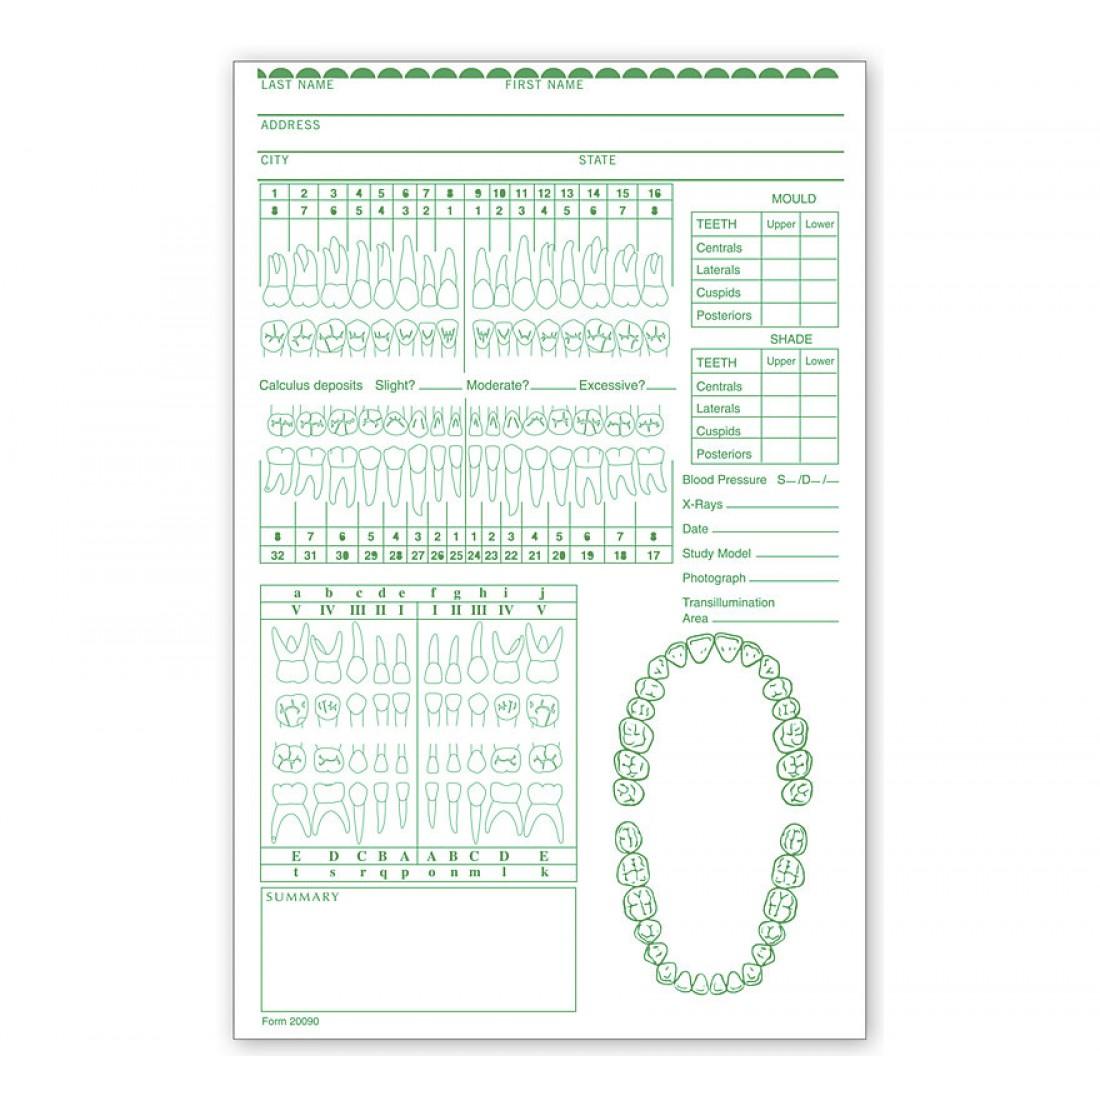 Dental Re-Examination Record